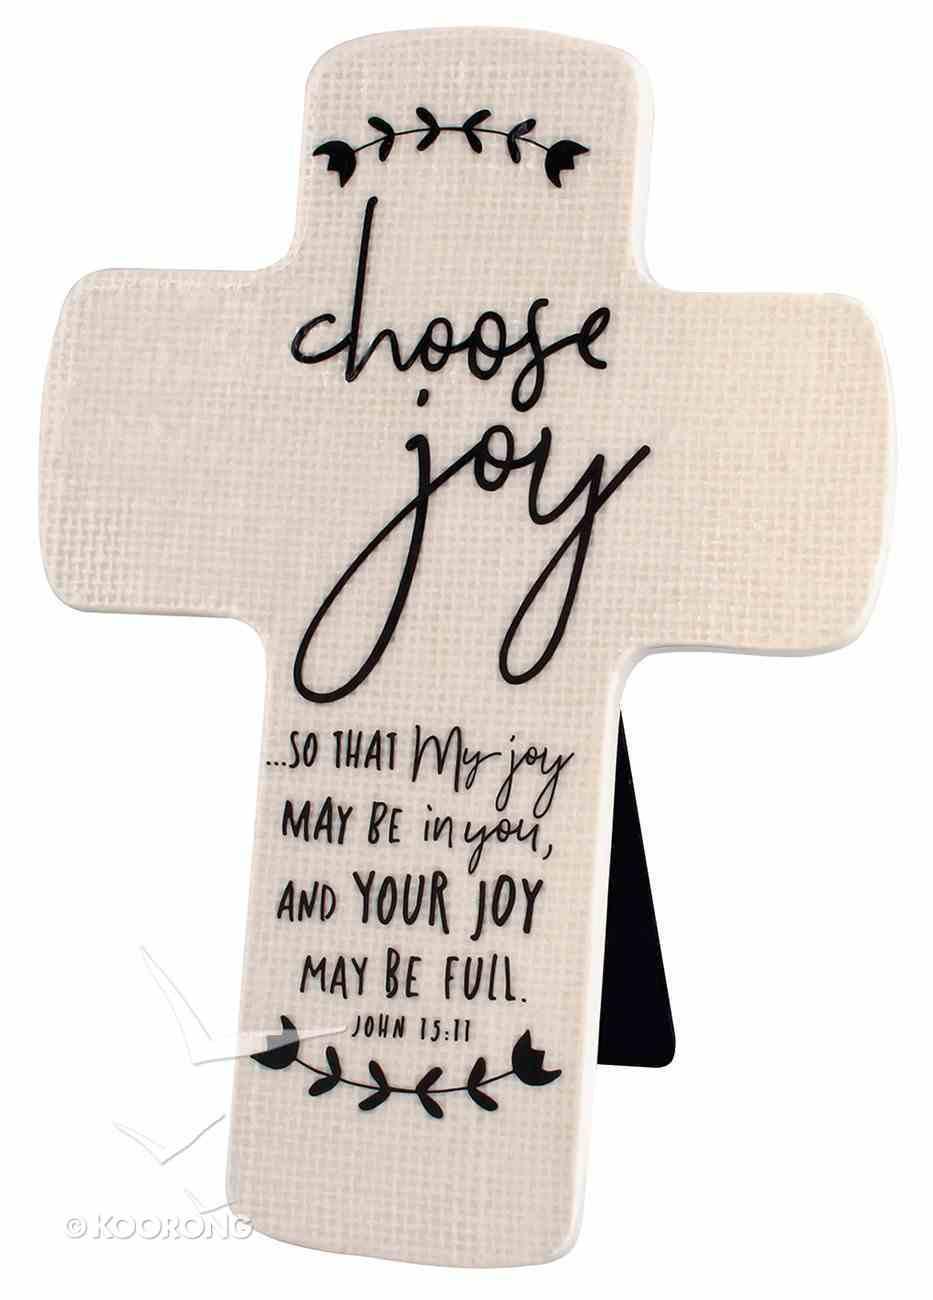 Cross Ceramic Hand Drawn Doodles: Choose Joy (John 15:11) Plaque